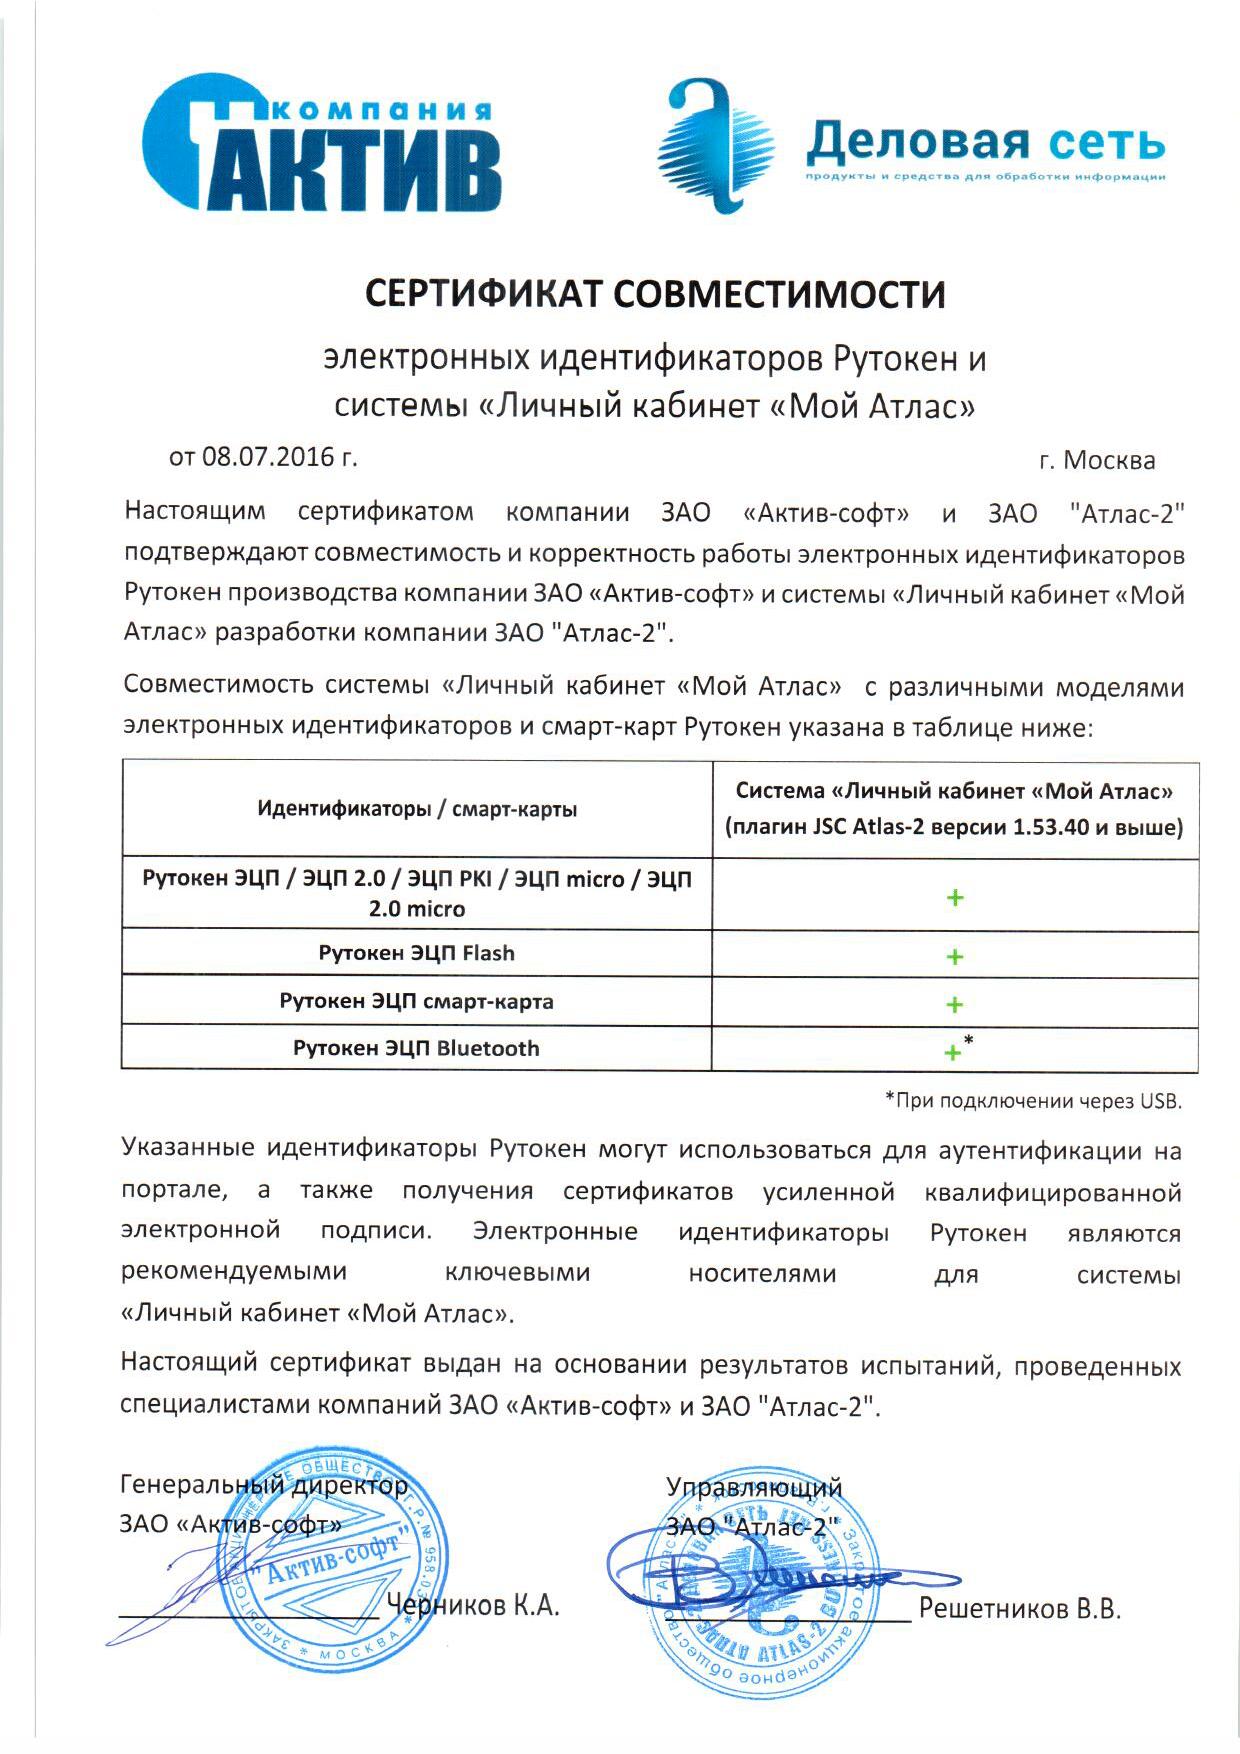 Сертификат совместимости Рутокен